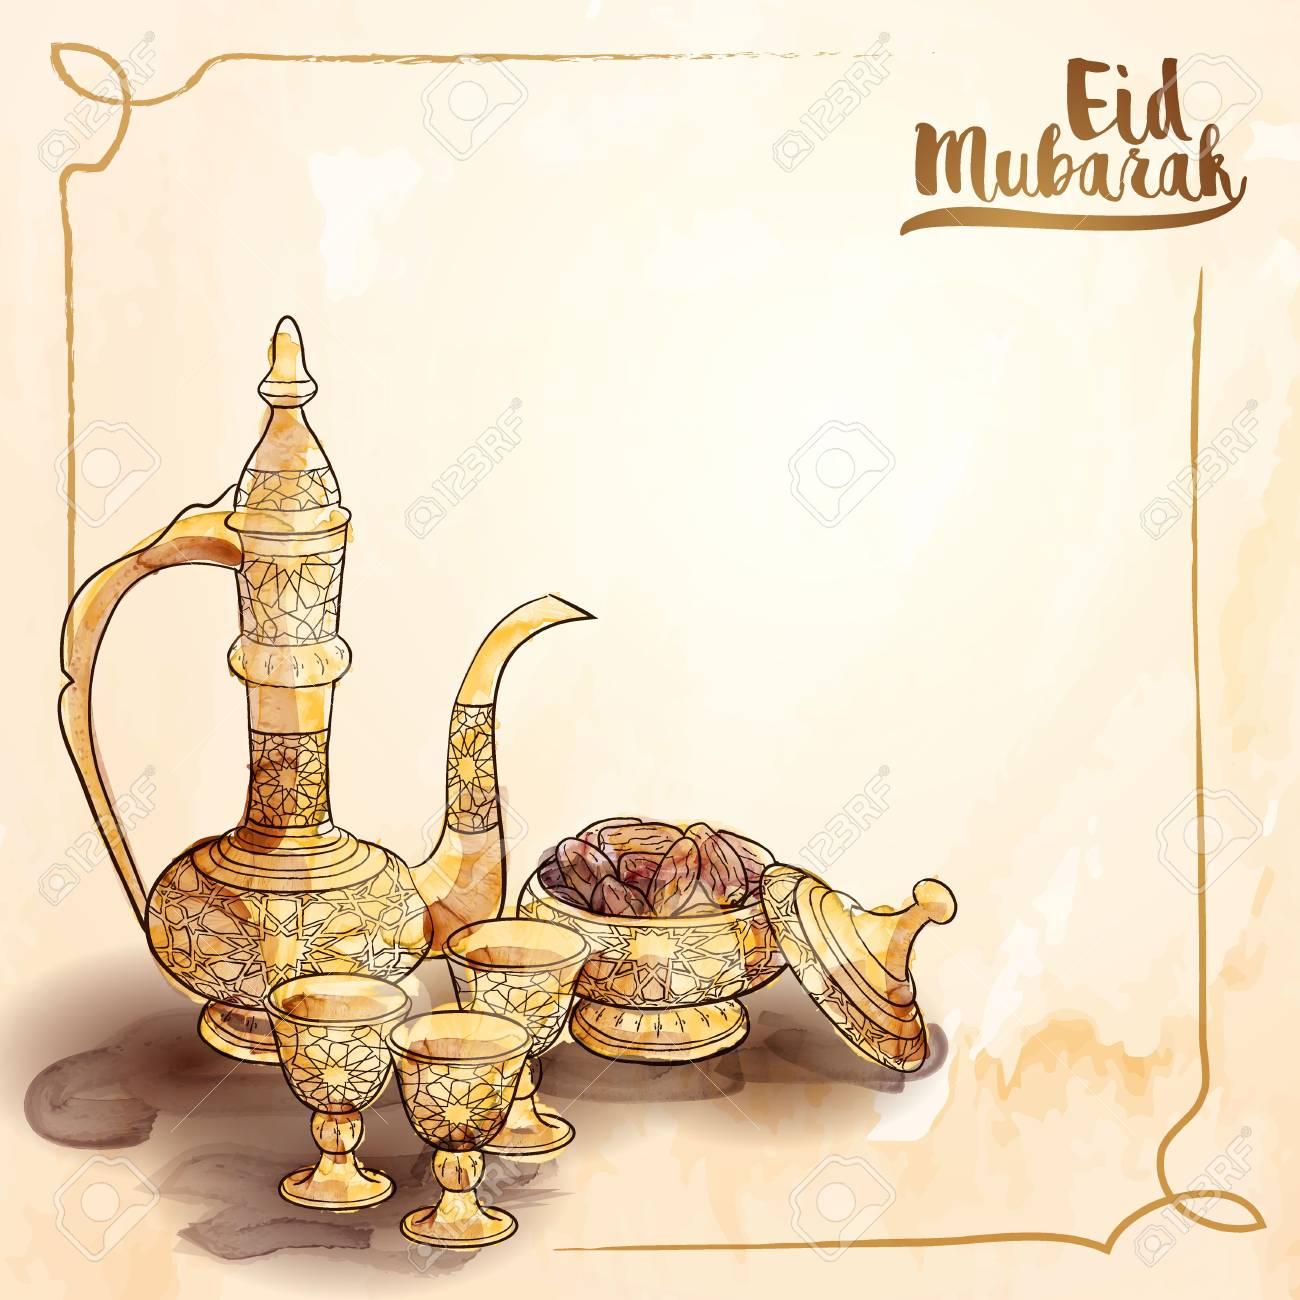 Eid mubarak islamic greeting background with arabic traditional eid mubarak islamic greeting background with arabic traditional teapot and date fruit vector illustration stock vector m4hsunfo